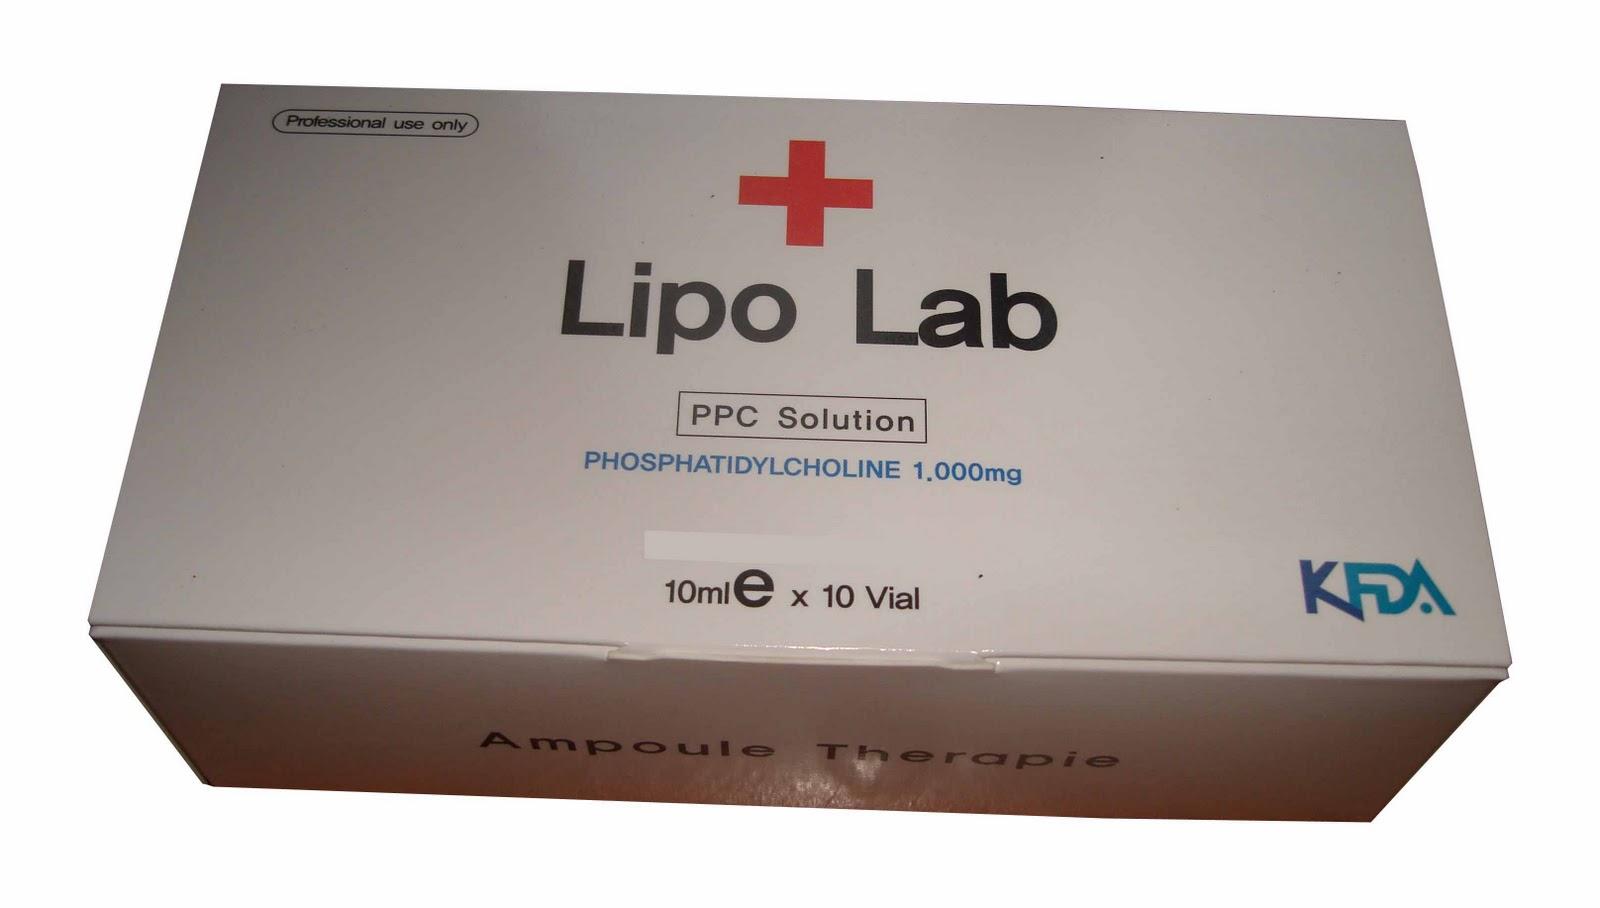 Vivie Beauty Shack: Lipo-Lab Phosphatidyl Choline Slimming Injection